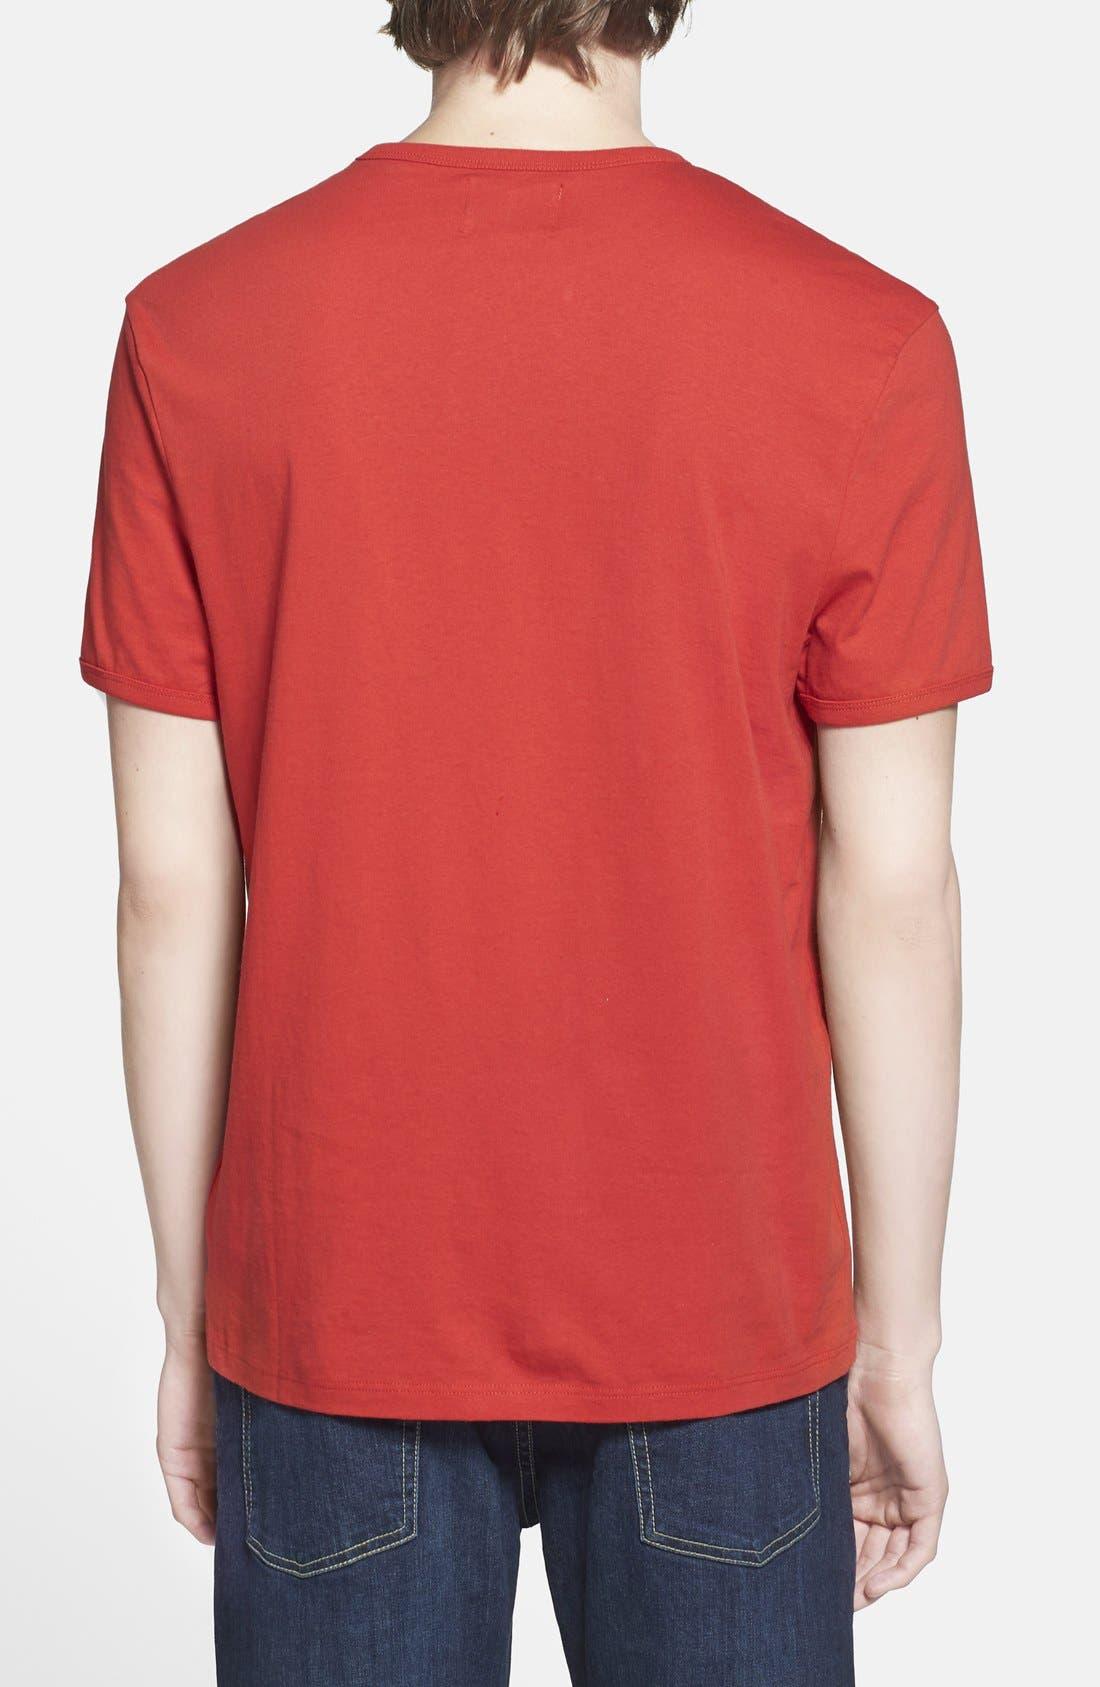 Alternate Image 2  - Topman 'Alright' Jersey T-Shirt (Brit Pop-In) (Nordstrom Exclusive)